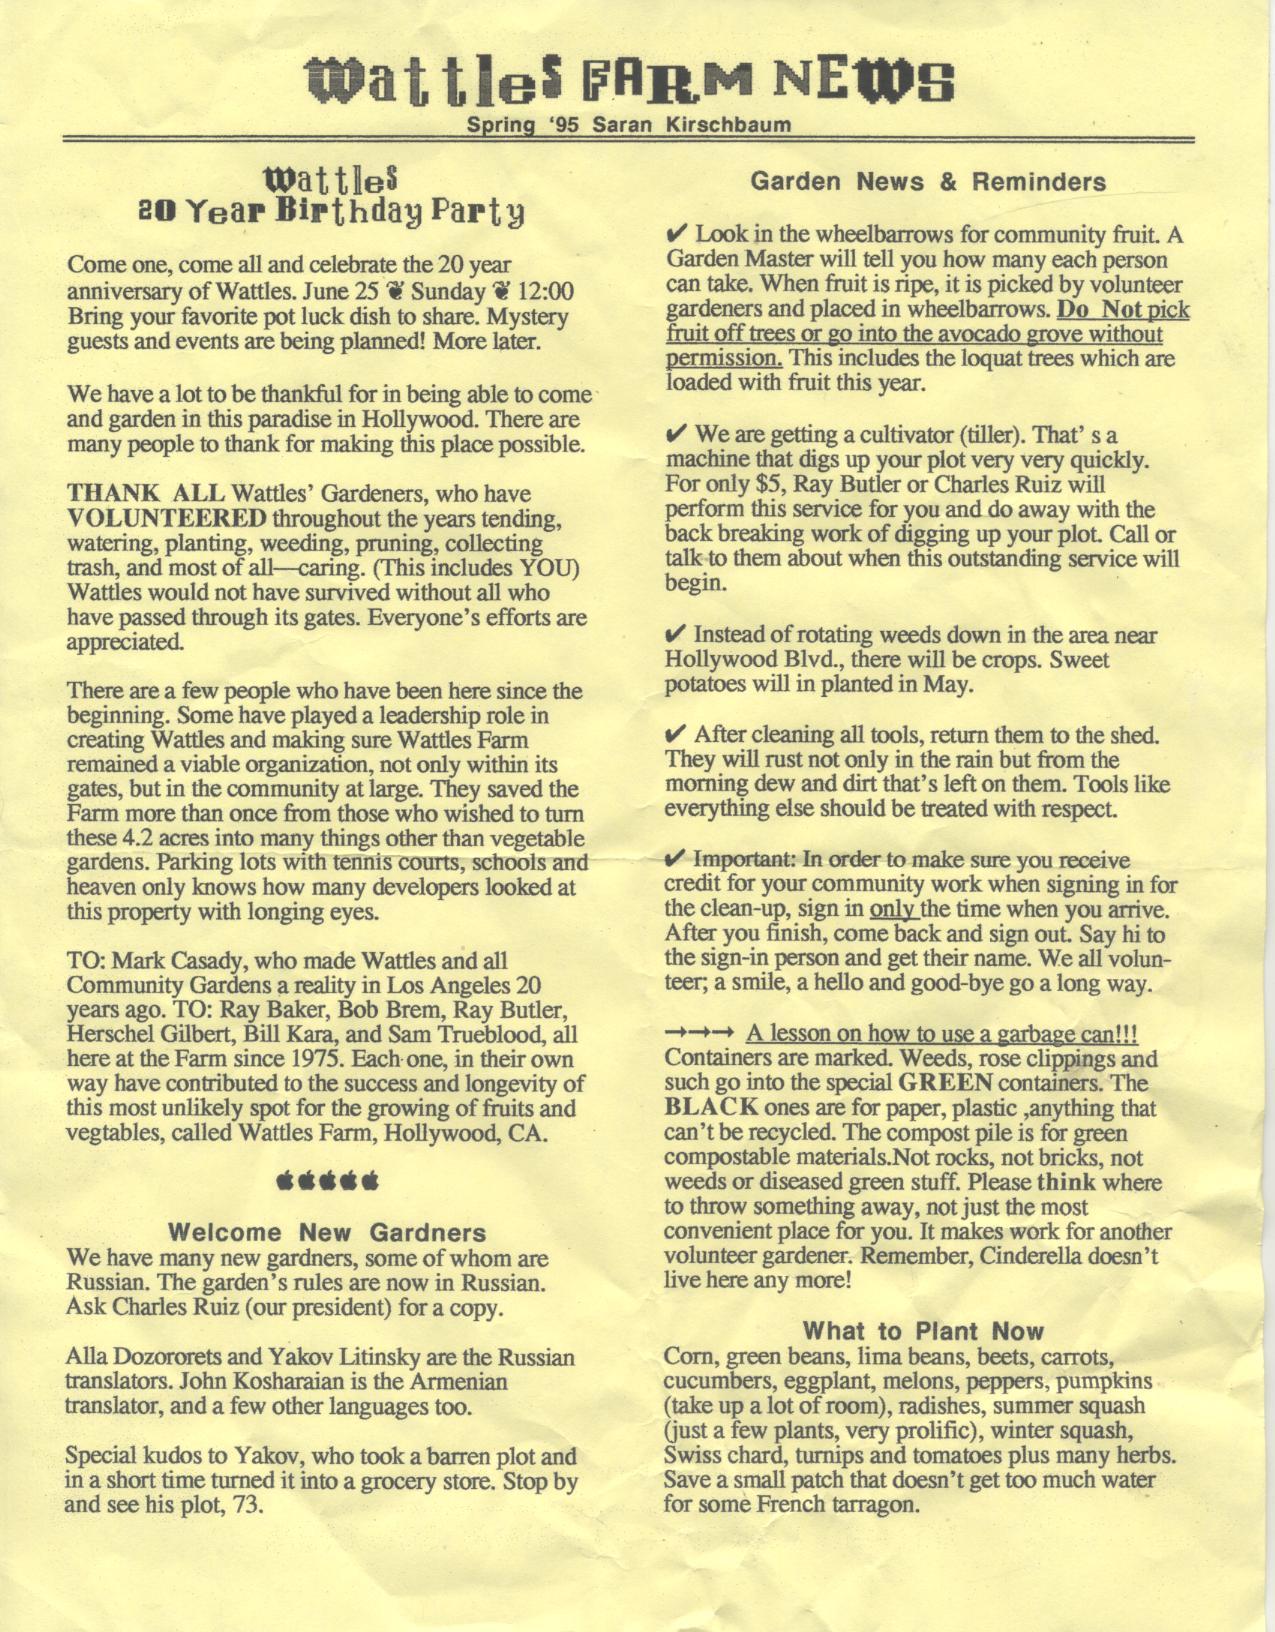 Wattles Newsletter Spring '95